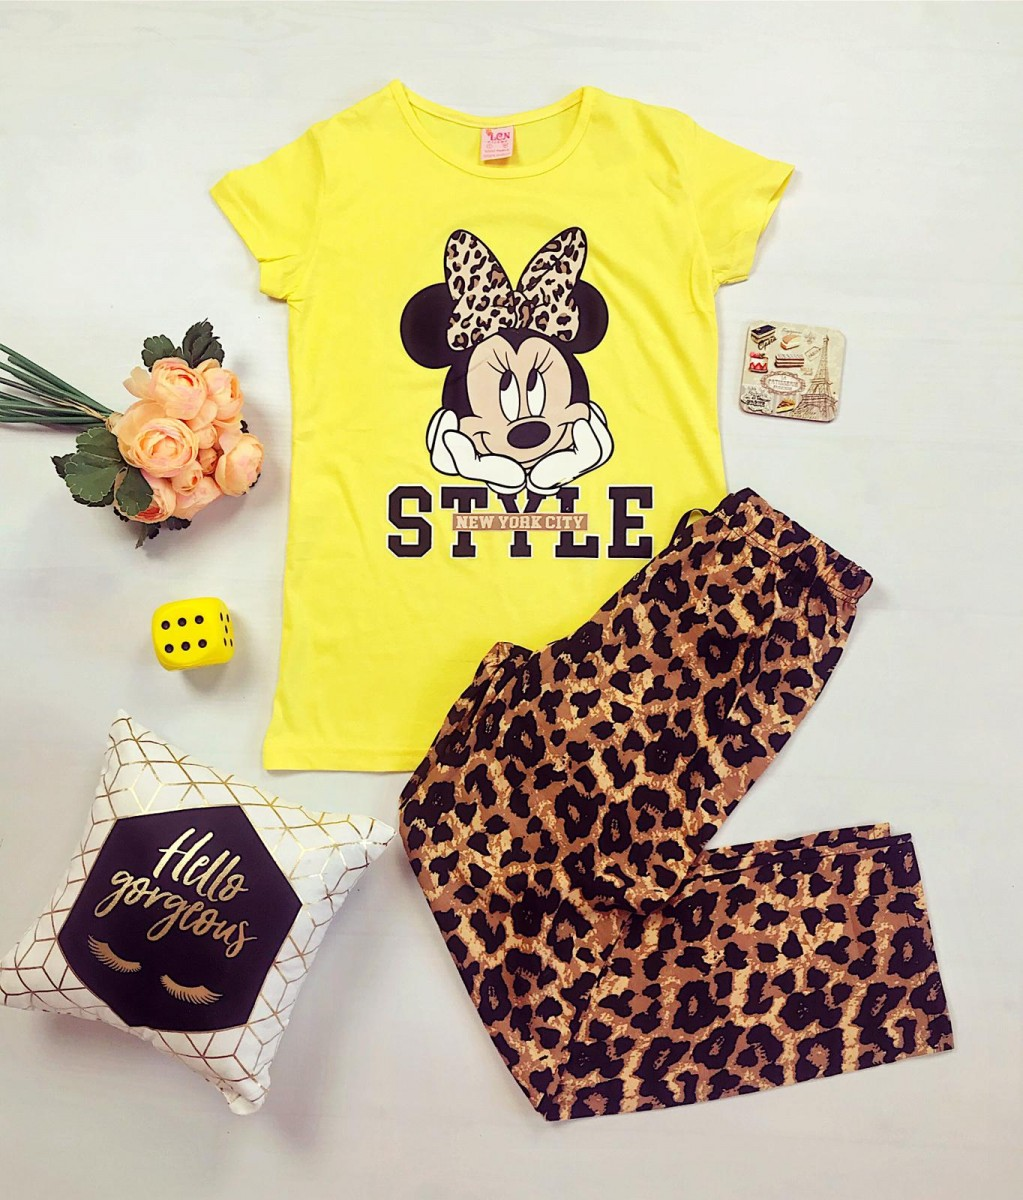 Pijama dama ieftina din bumbac cu pantaloni lungi animal print si tricou galben cu imprimeu MM Style